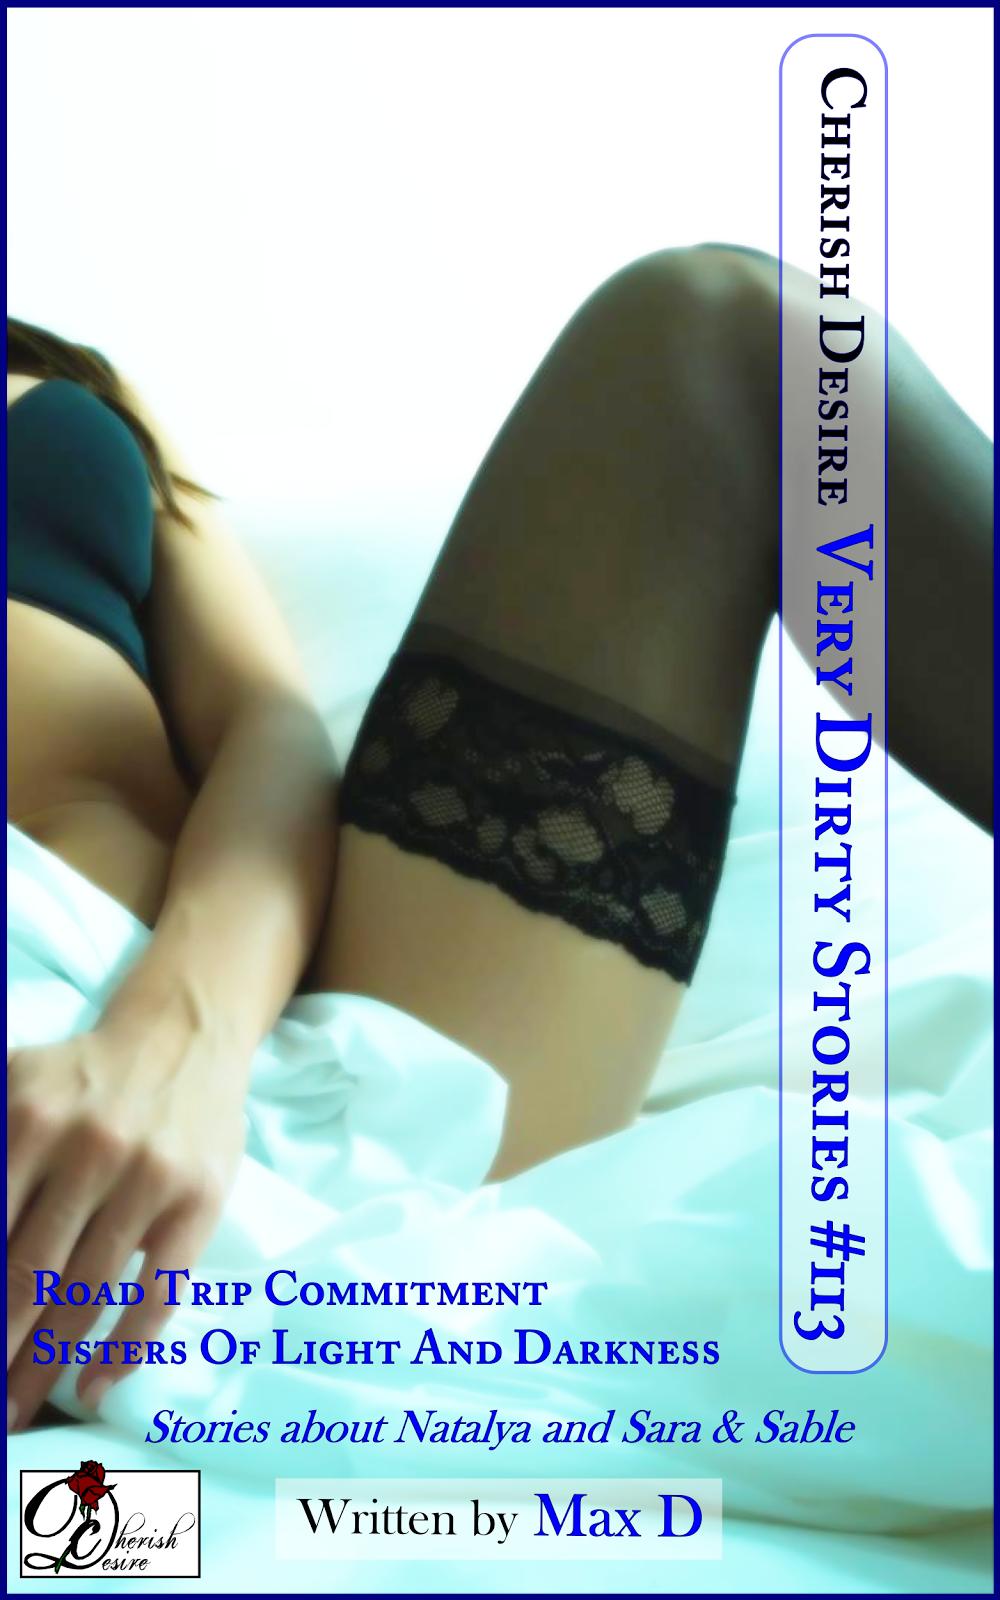 Cherish Desire: Very Dirty Stories #113, Max D, erotica